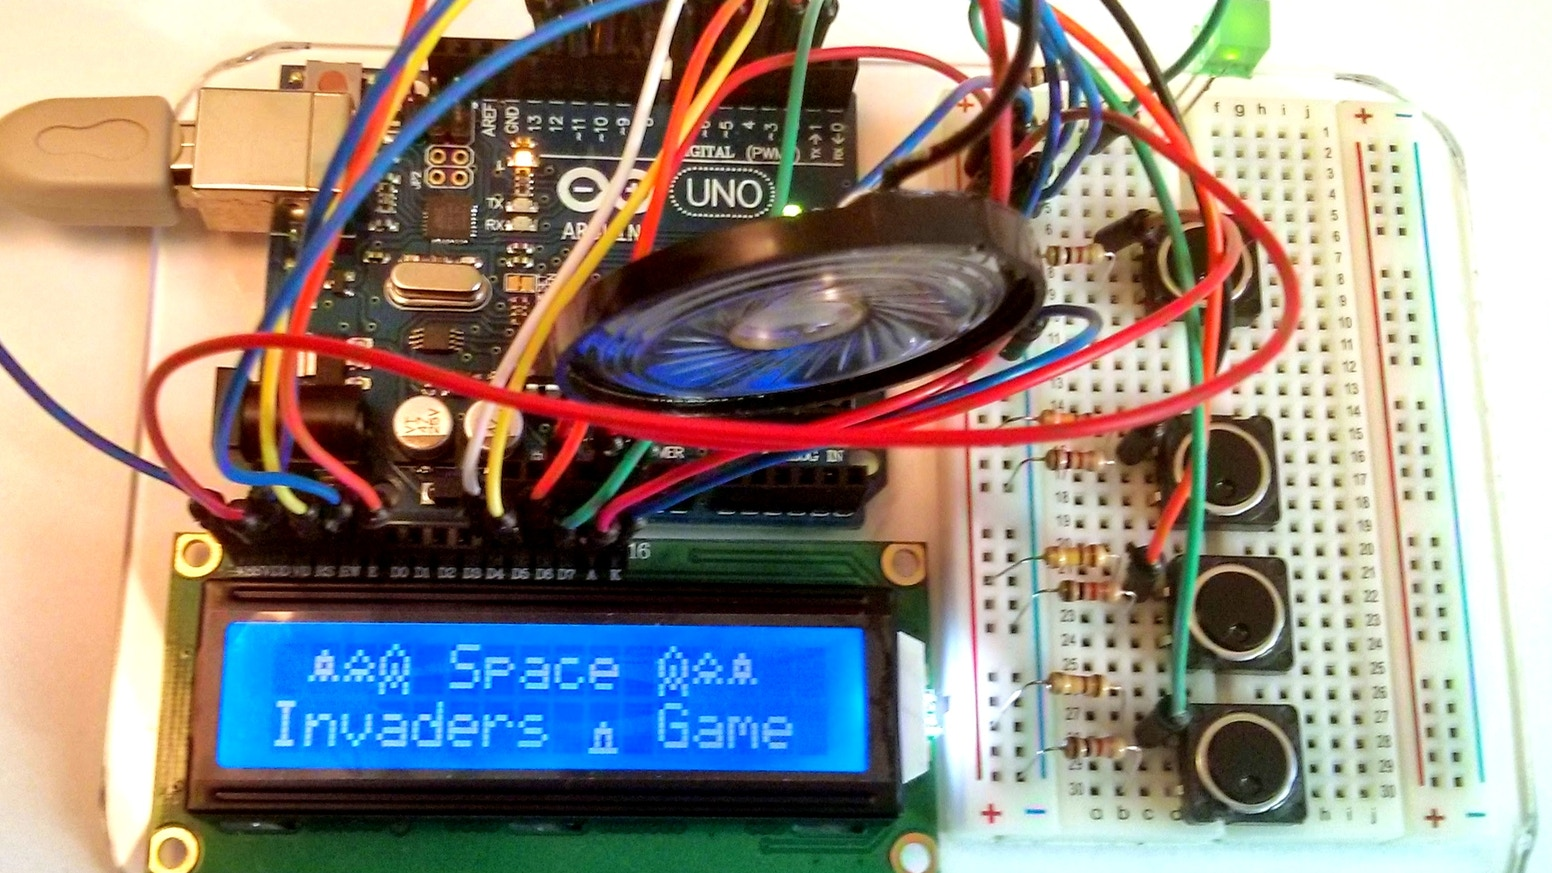 The Jesseybug Electronics & Arduino Inventors' Kits by